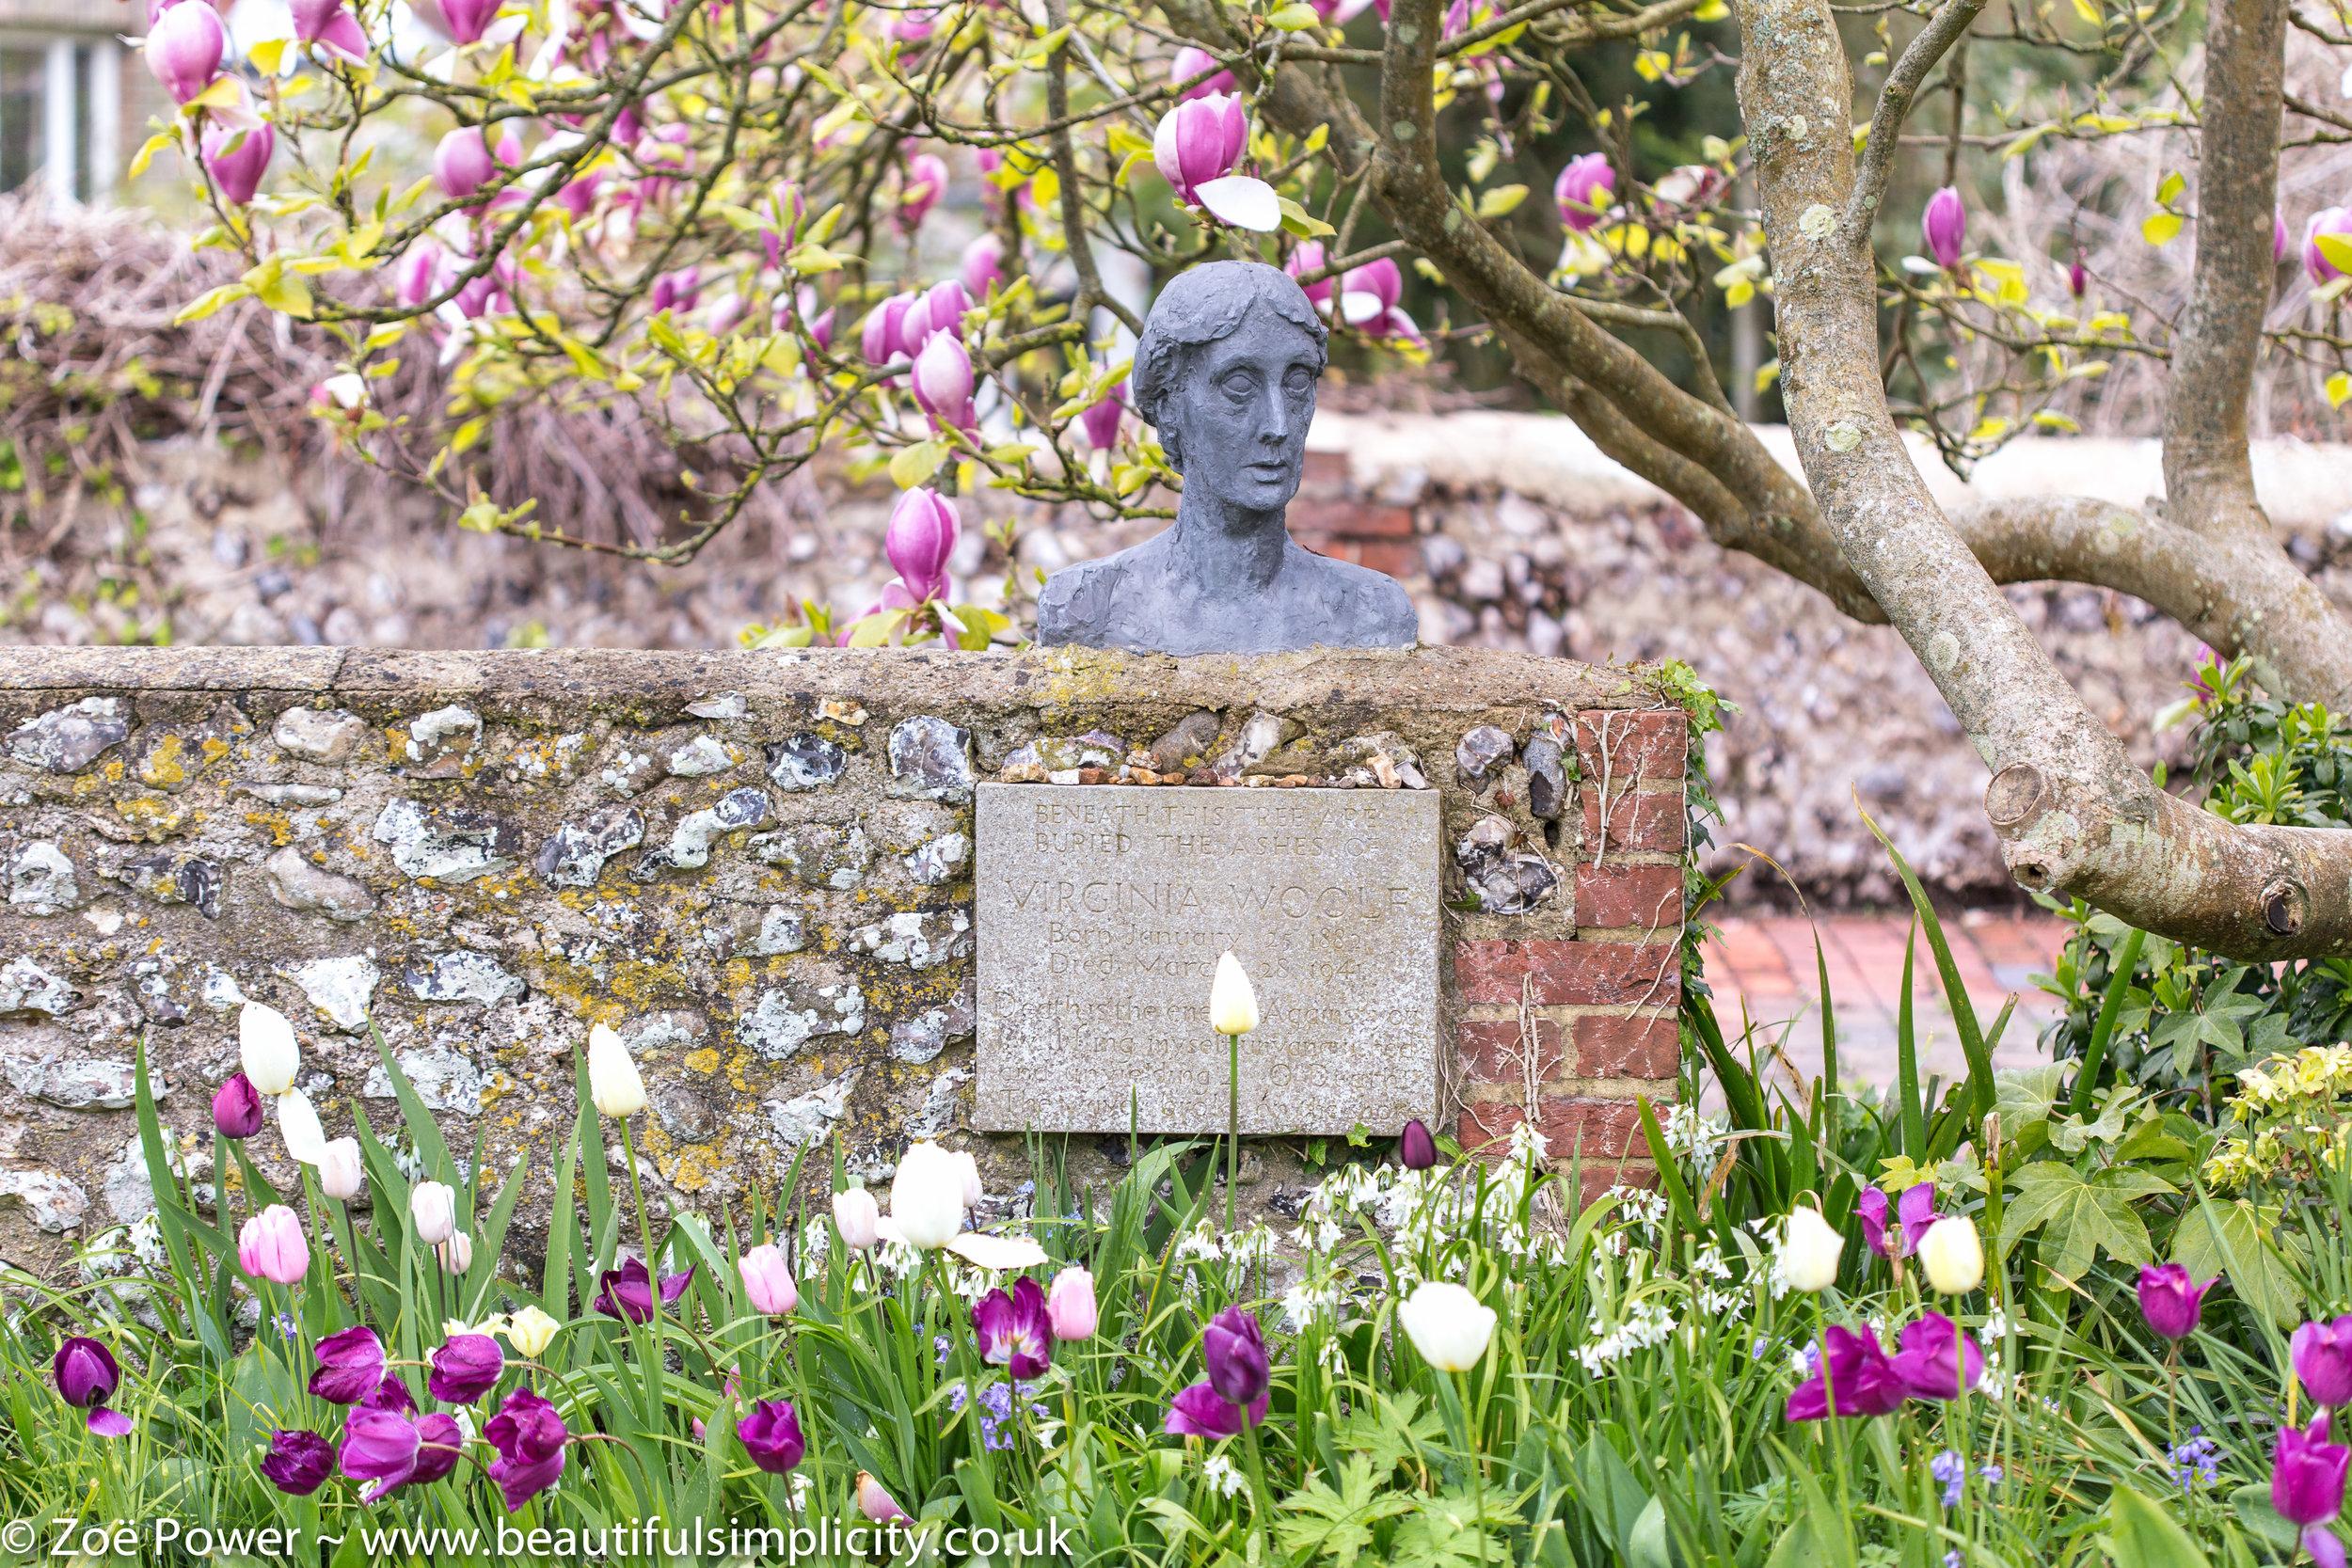 Monk's House: The Home of Virginia & Leonard Woolf